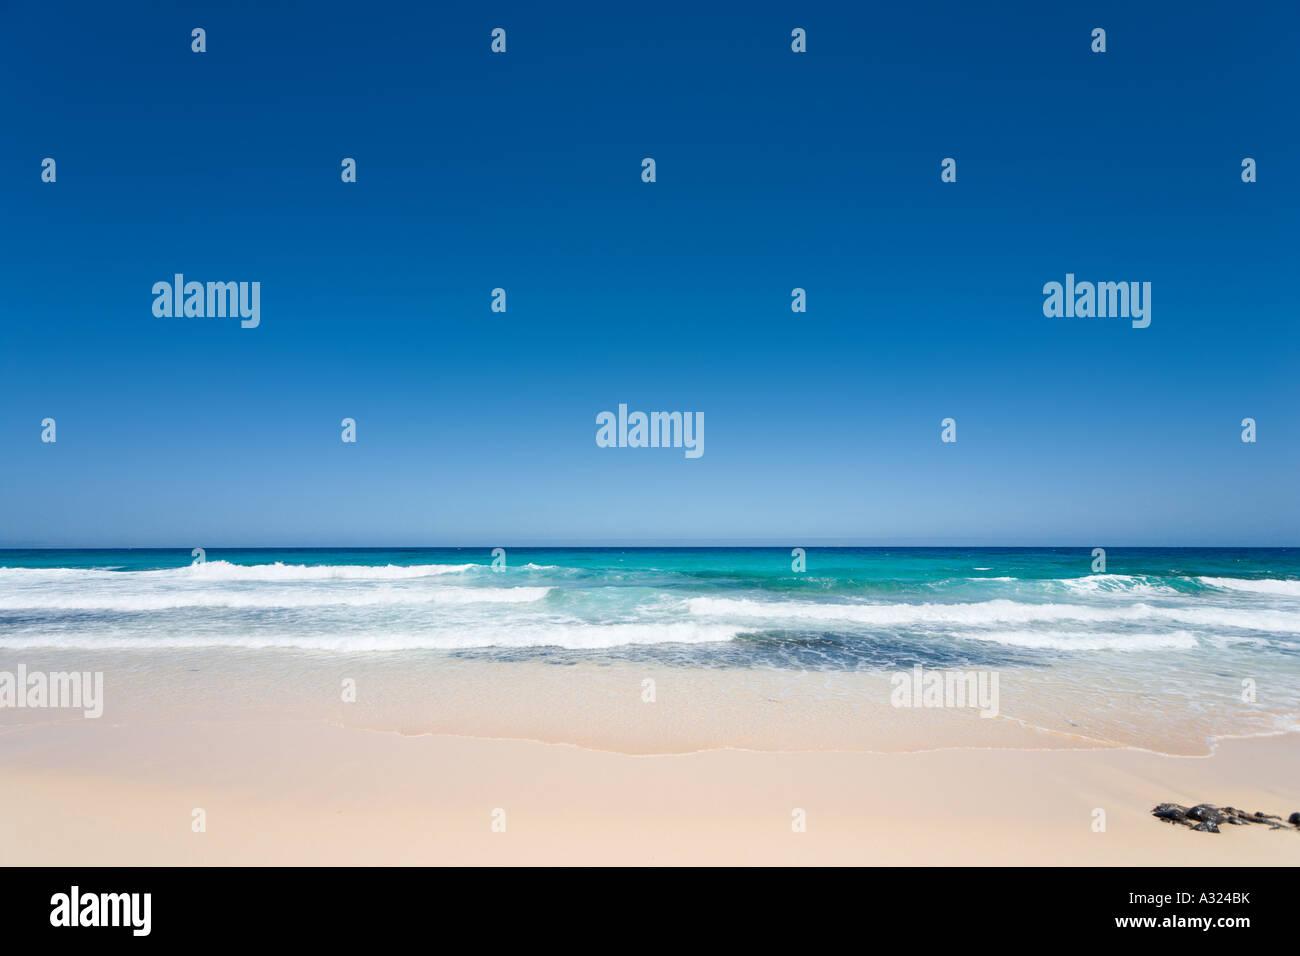 Beach in the Parque Natural de Corralejo, Fuerteventura, Canary Islands, Spain - Stock Image